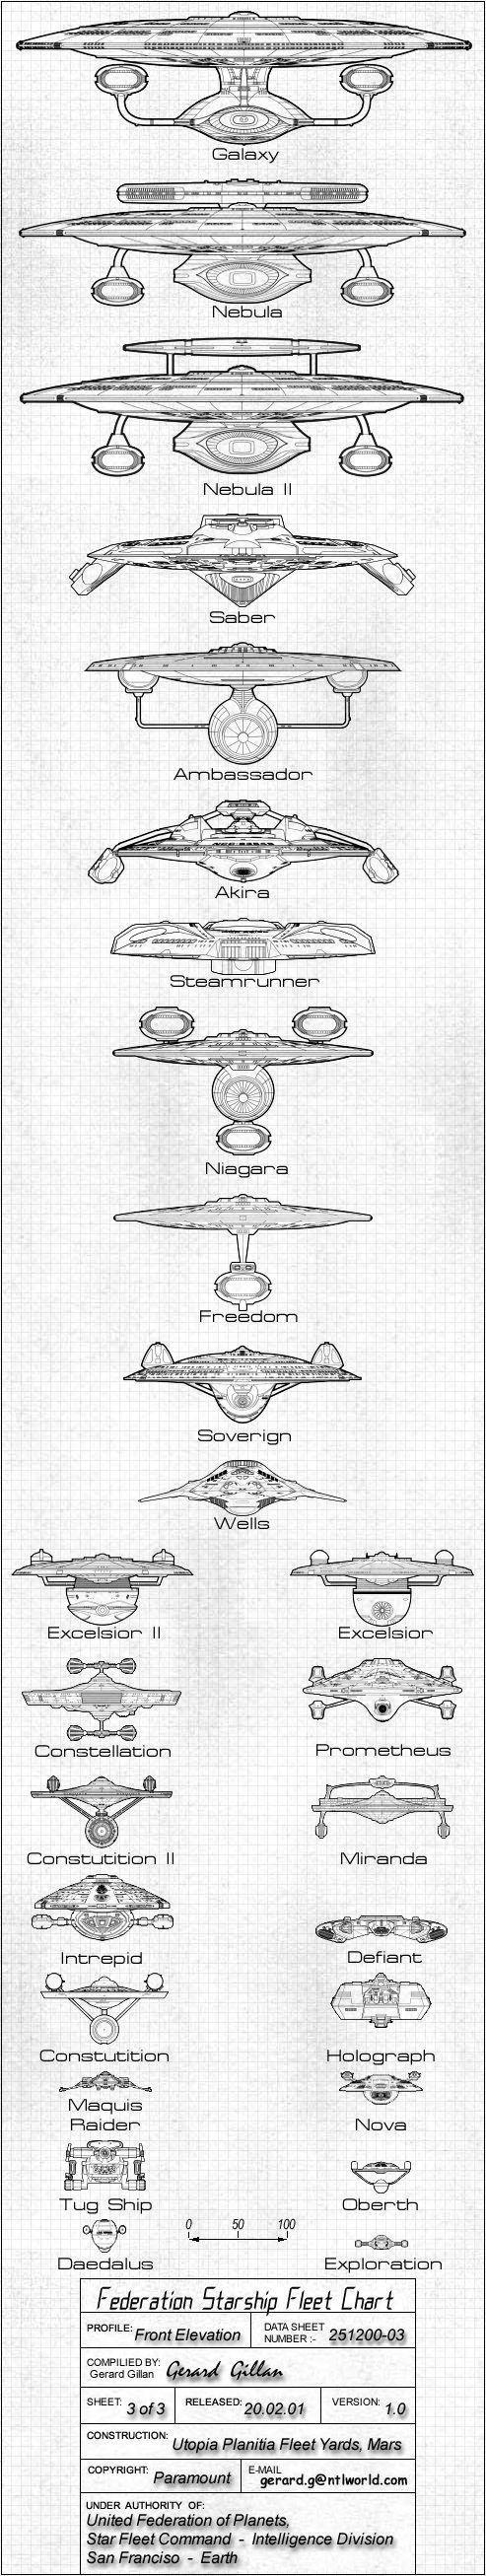 Federation Starship Fleet Chart - Front Elevation